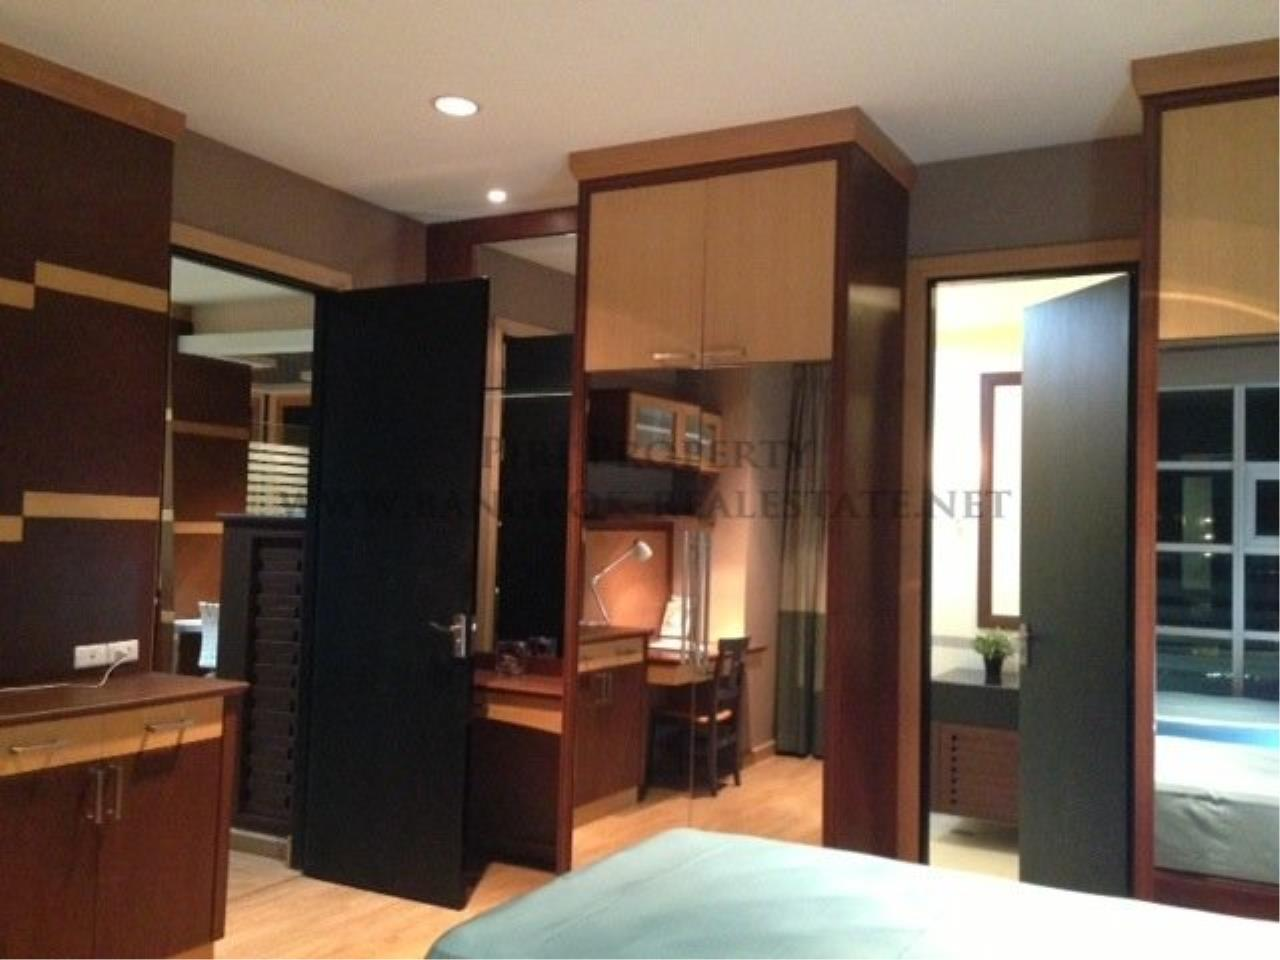 Piri Property Agency's Nice 1 Bedroom Condo near Ratchtewi BTS Station - 58 SQM - 30K 6